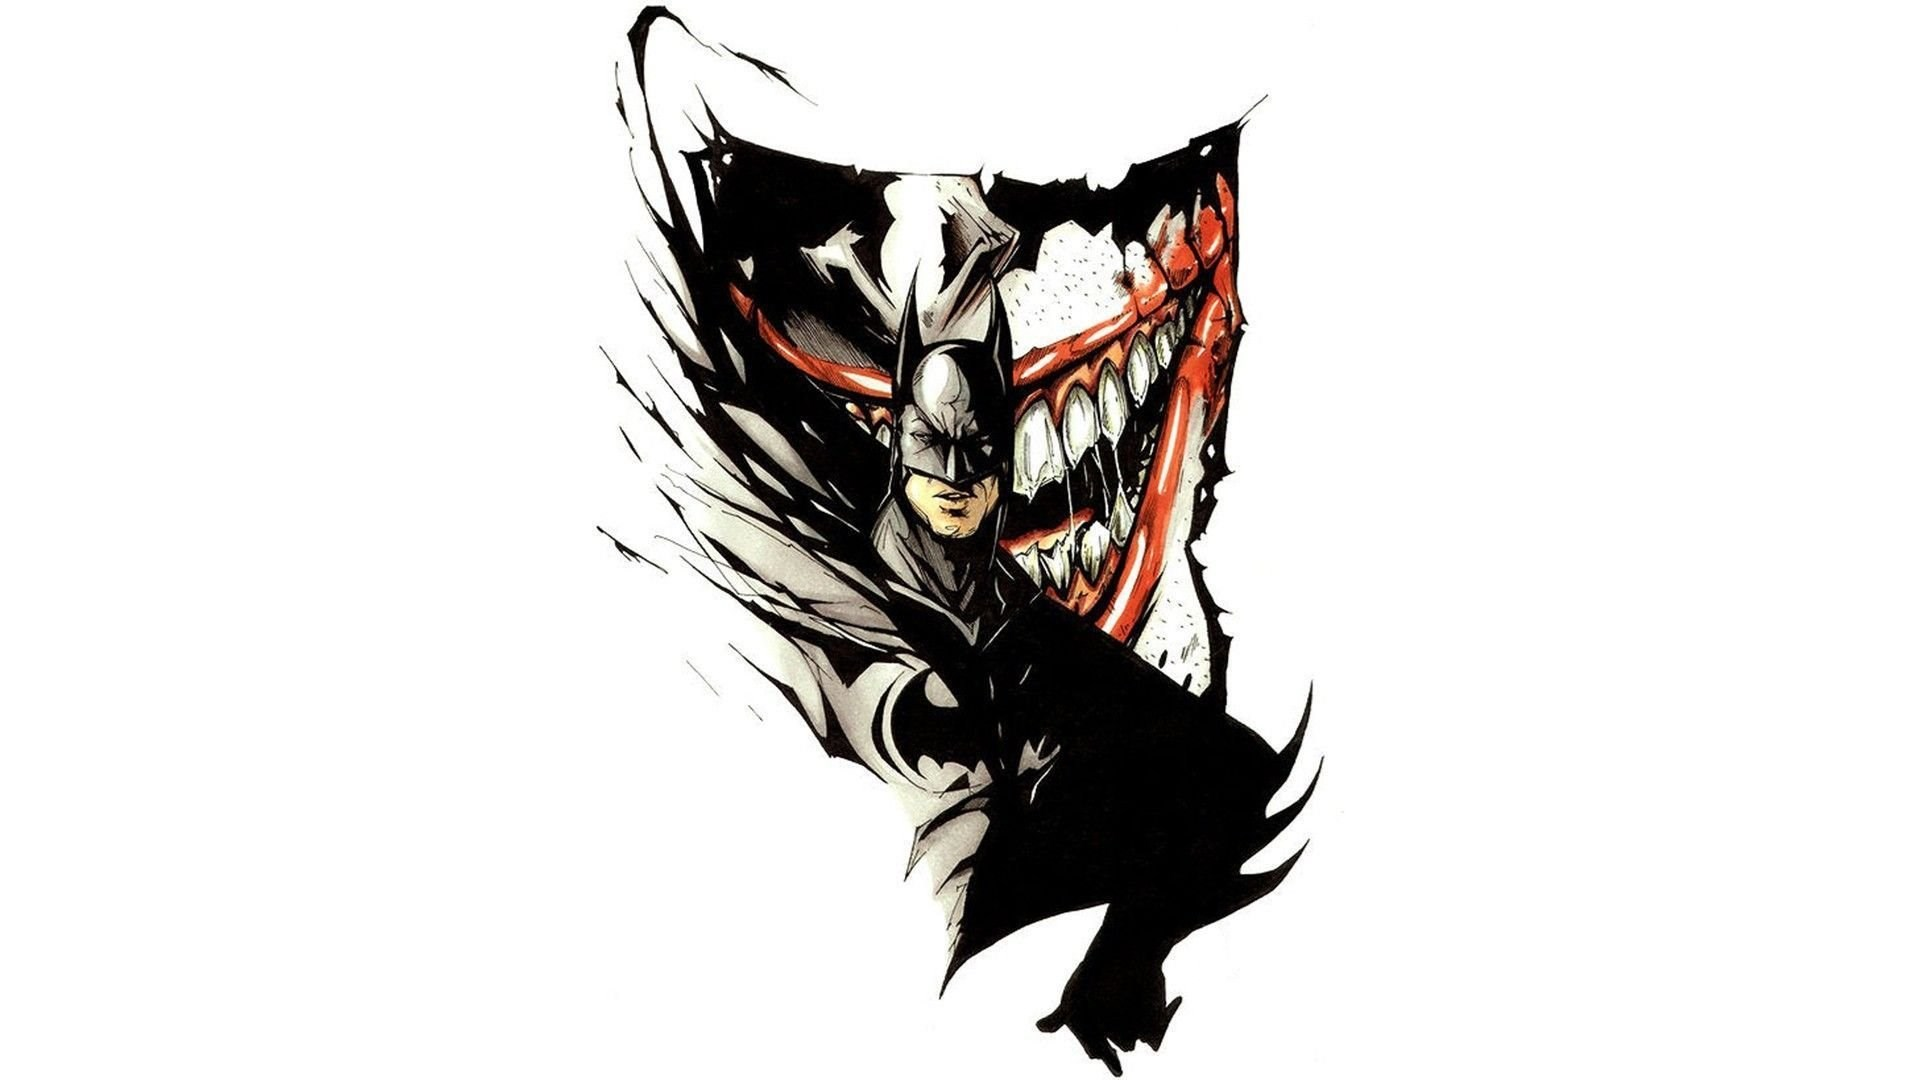 69 Joker Hd Wallpapers Desktop Background